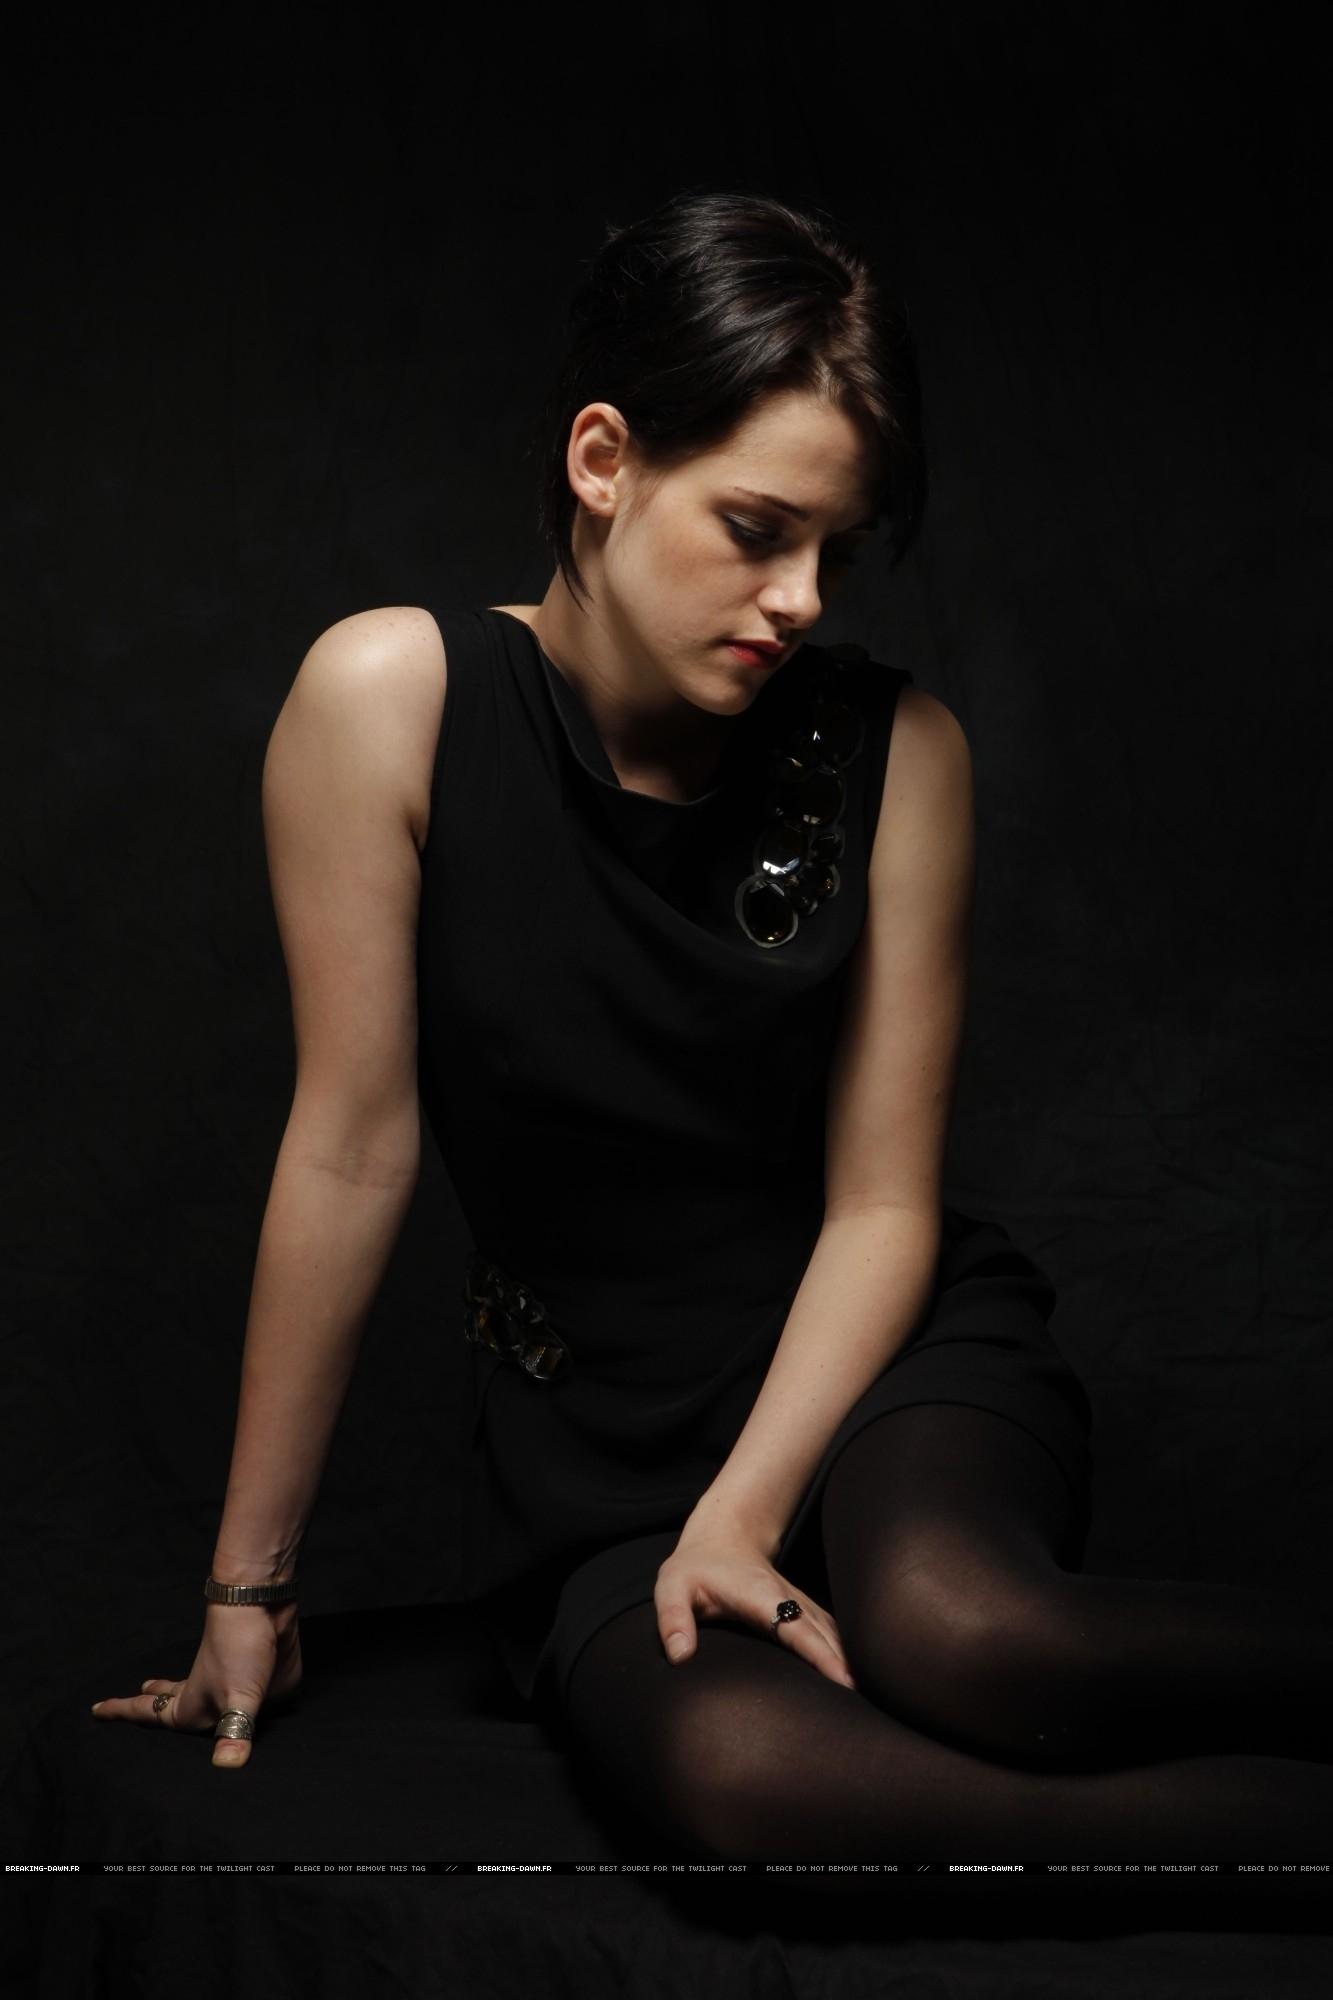 Kristen Stewart (USA Today) - photoshoot 20 pics / 20